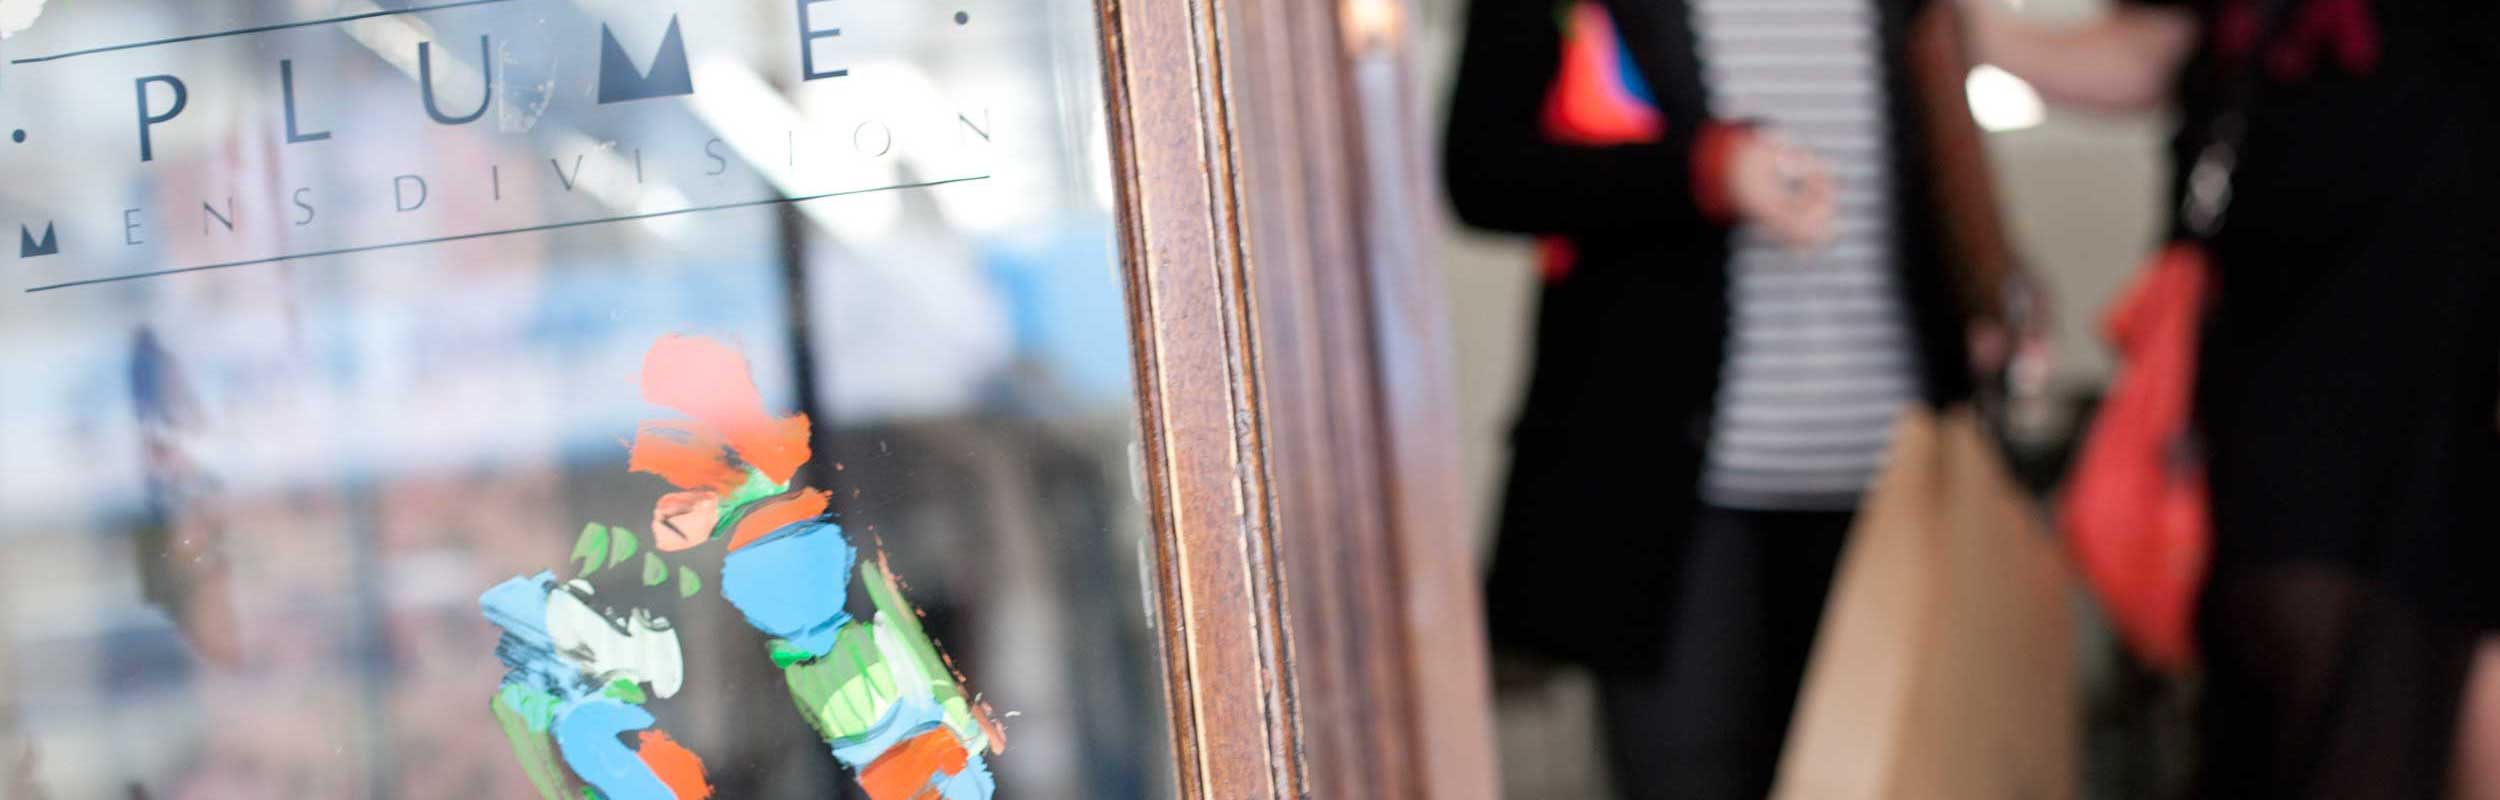 Dunedin Shopping Fashion at Plume